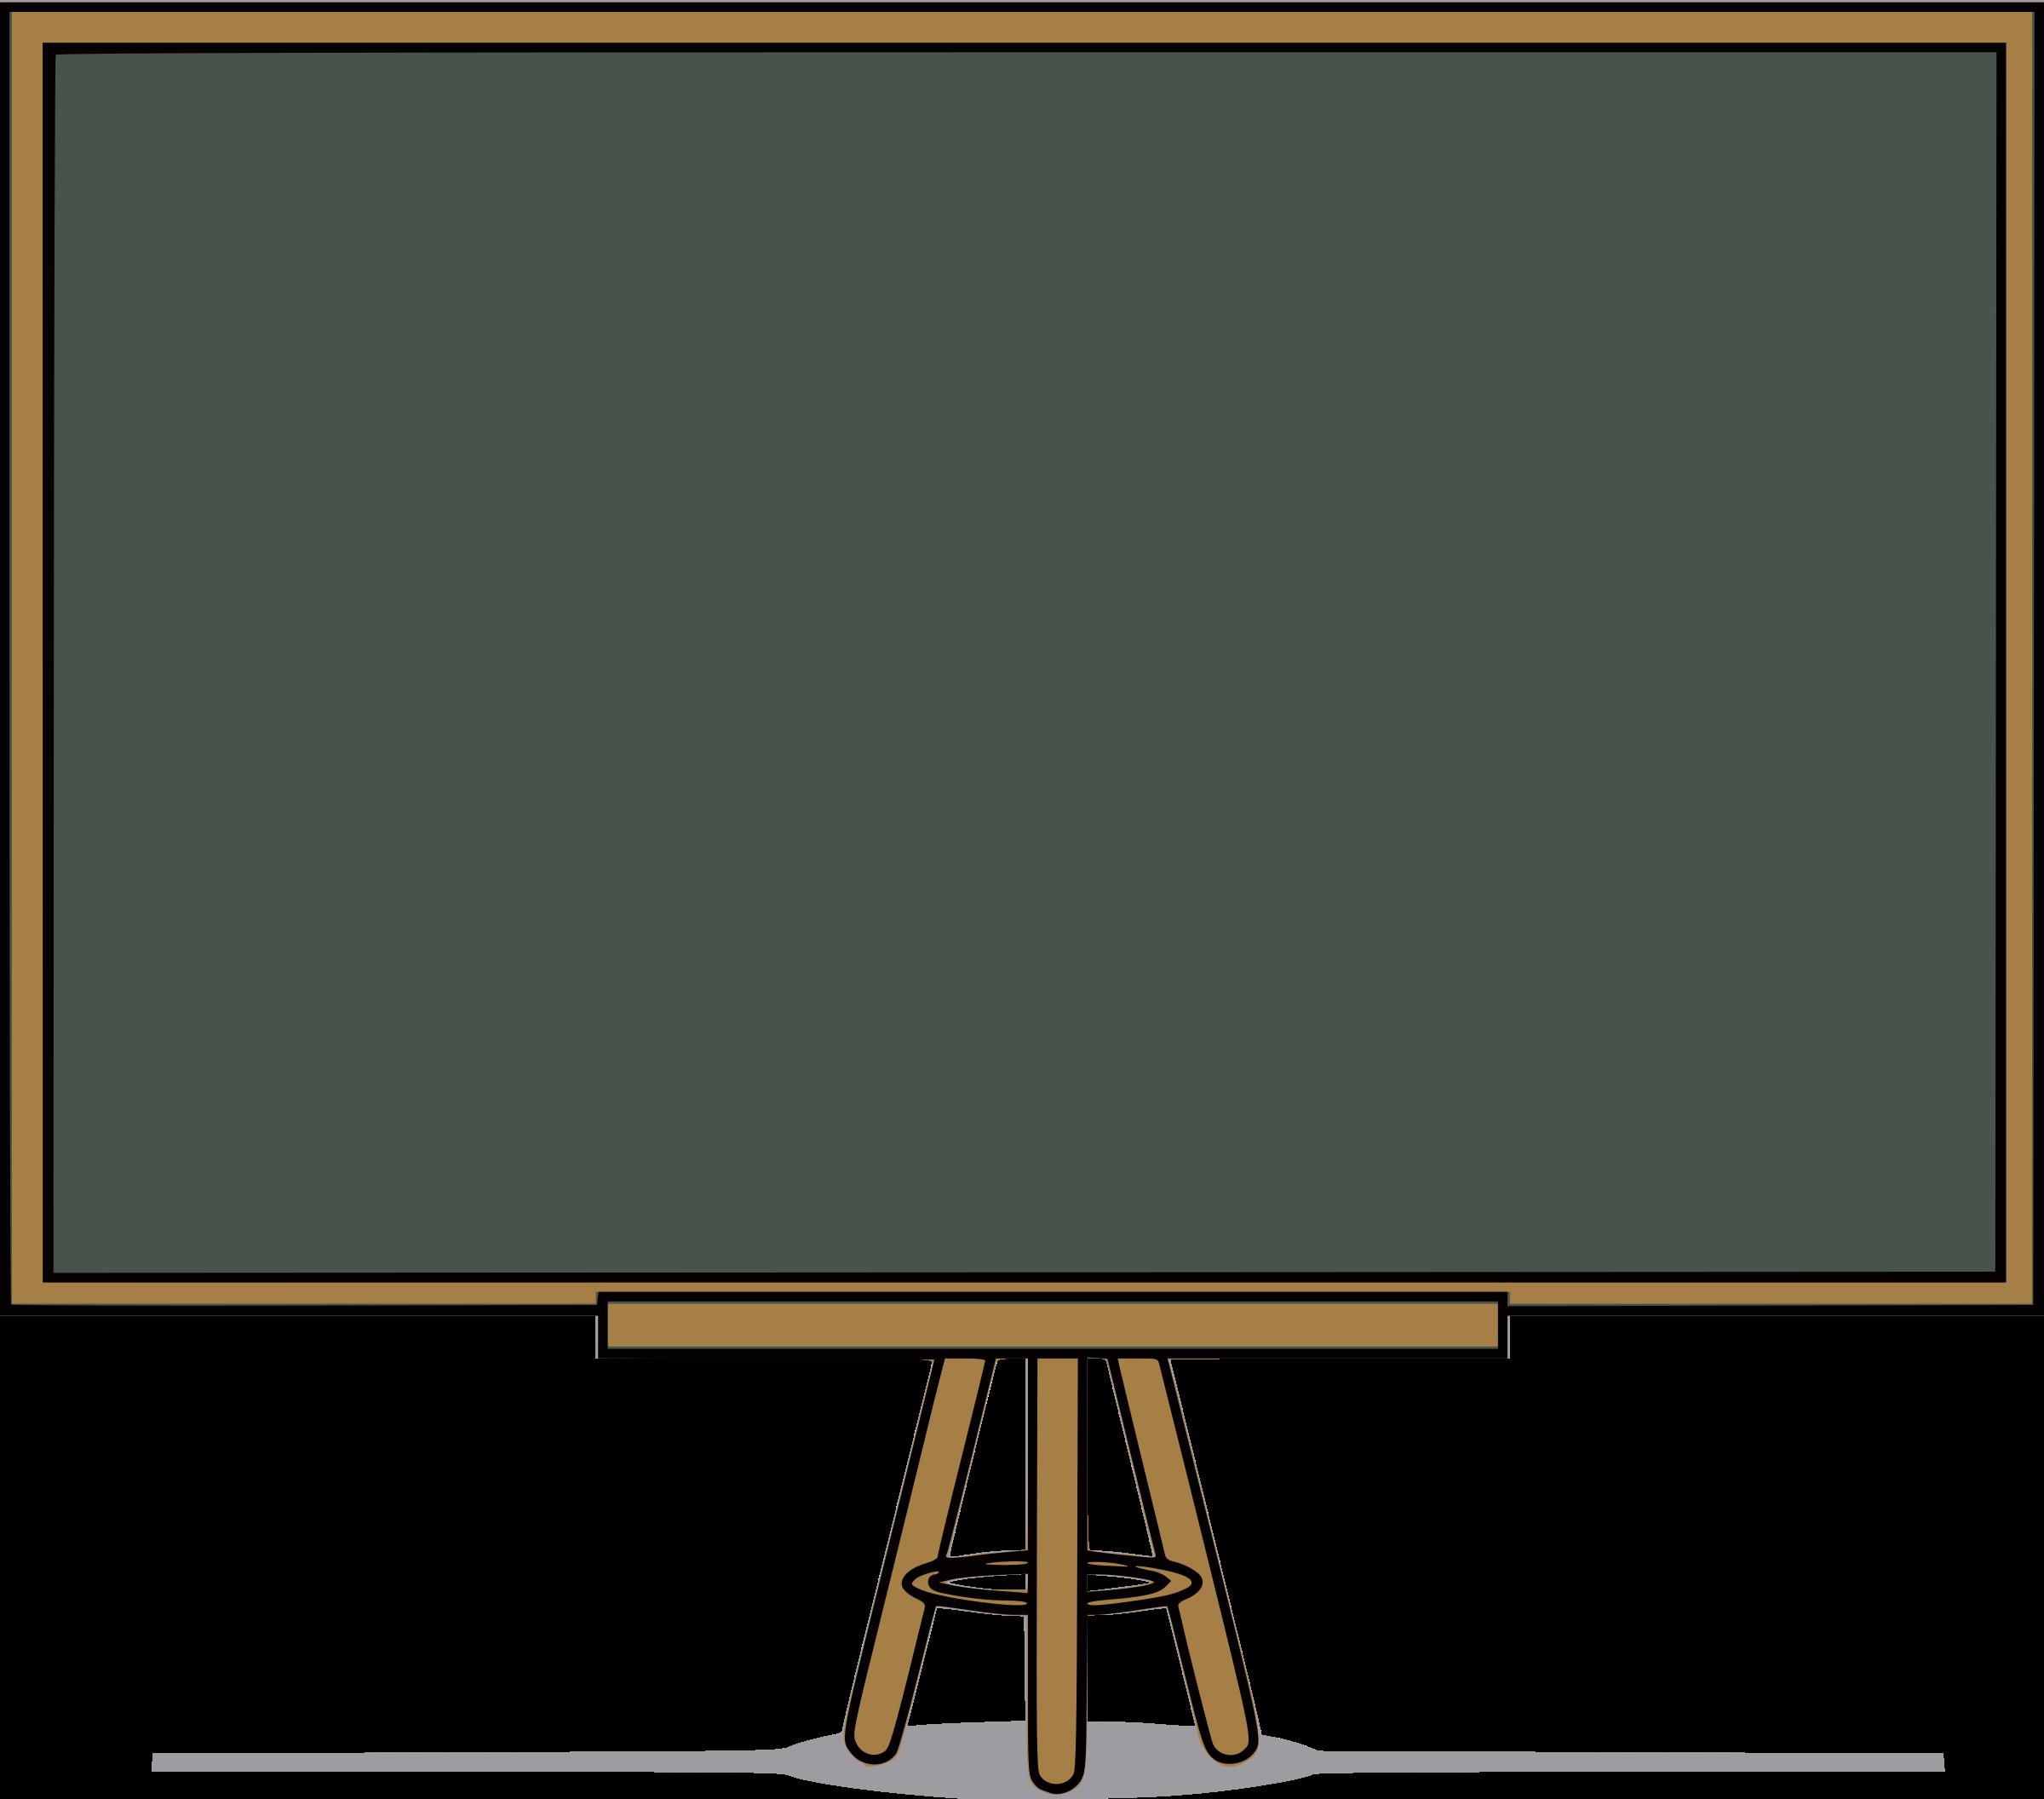 Big image png. Background clipart chalkboard